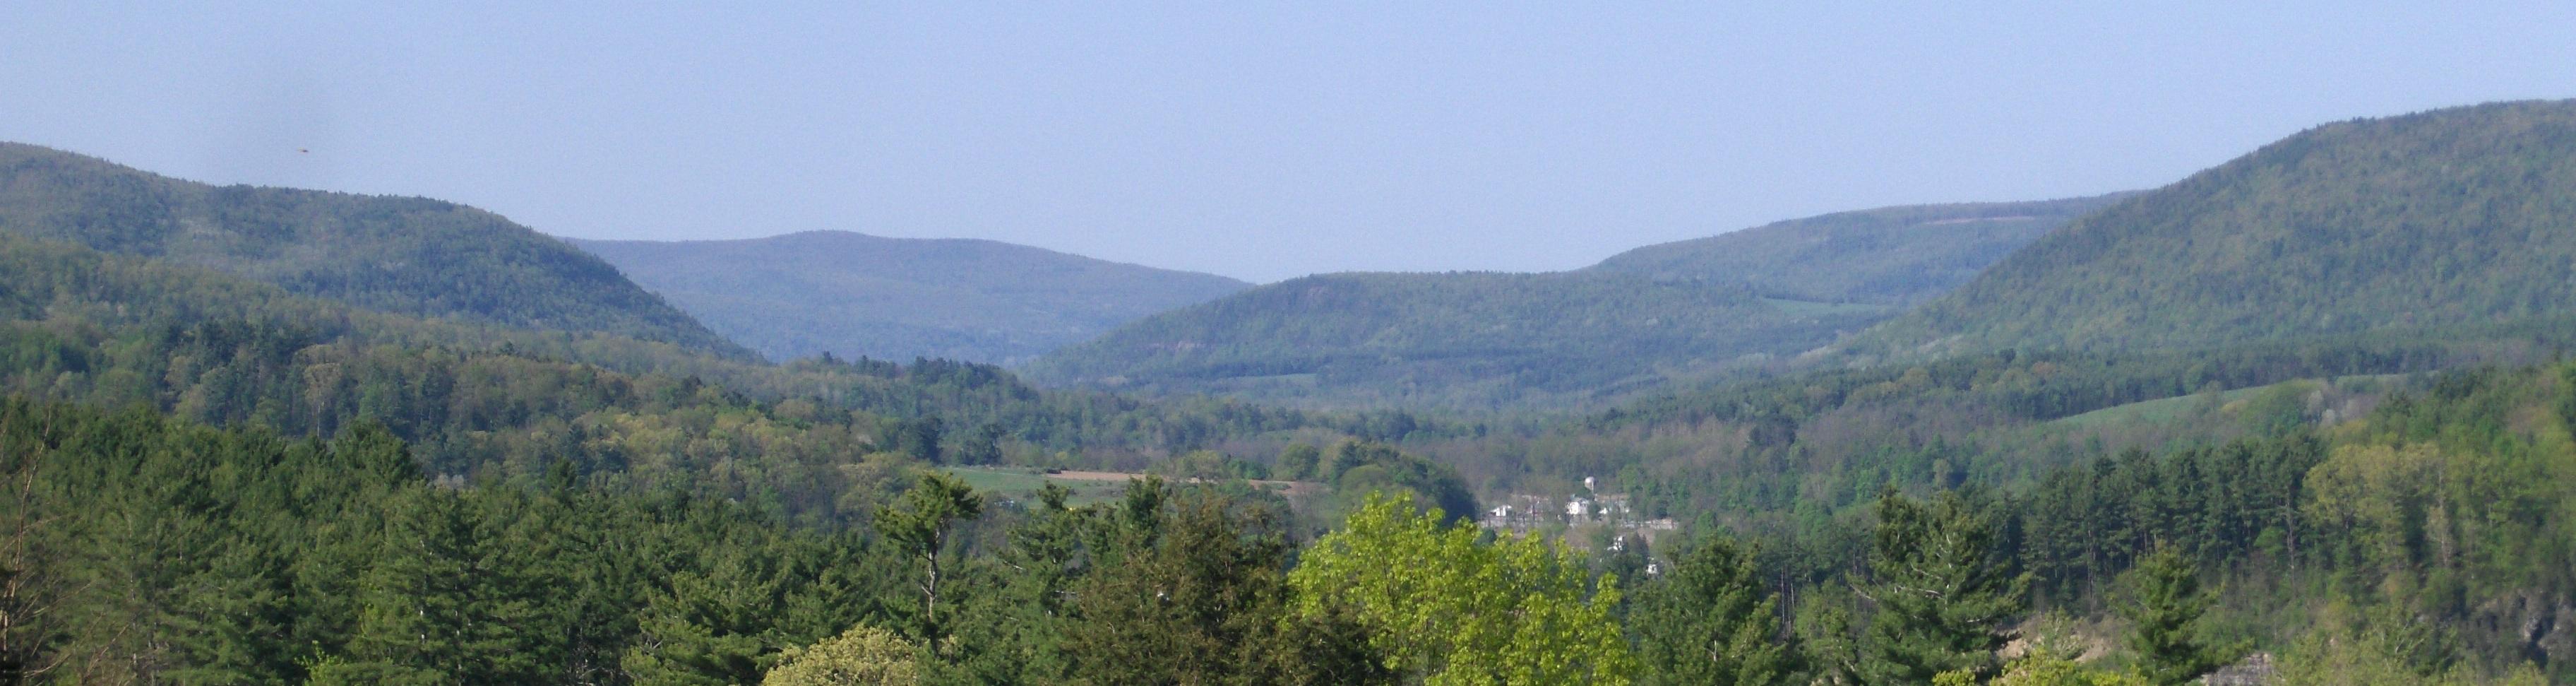 Hiking in Schoharie Countyschoharie county